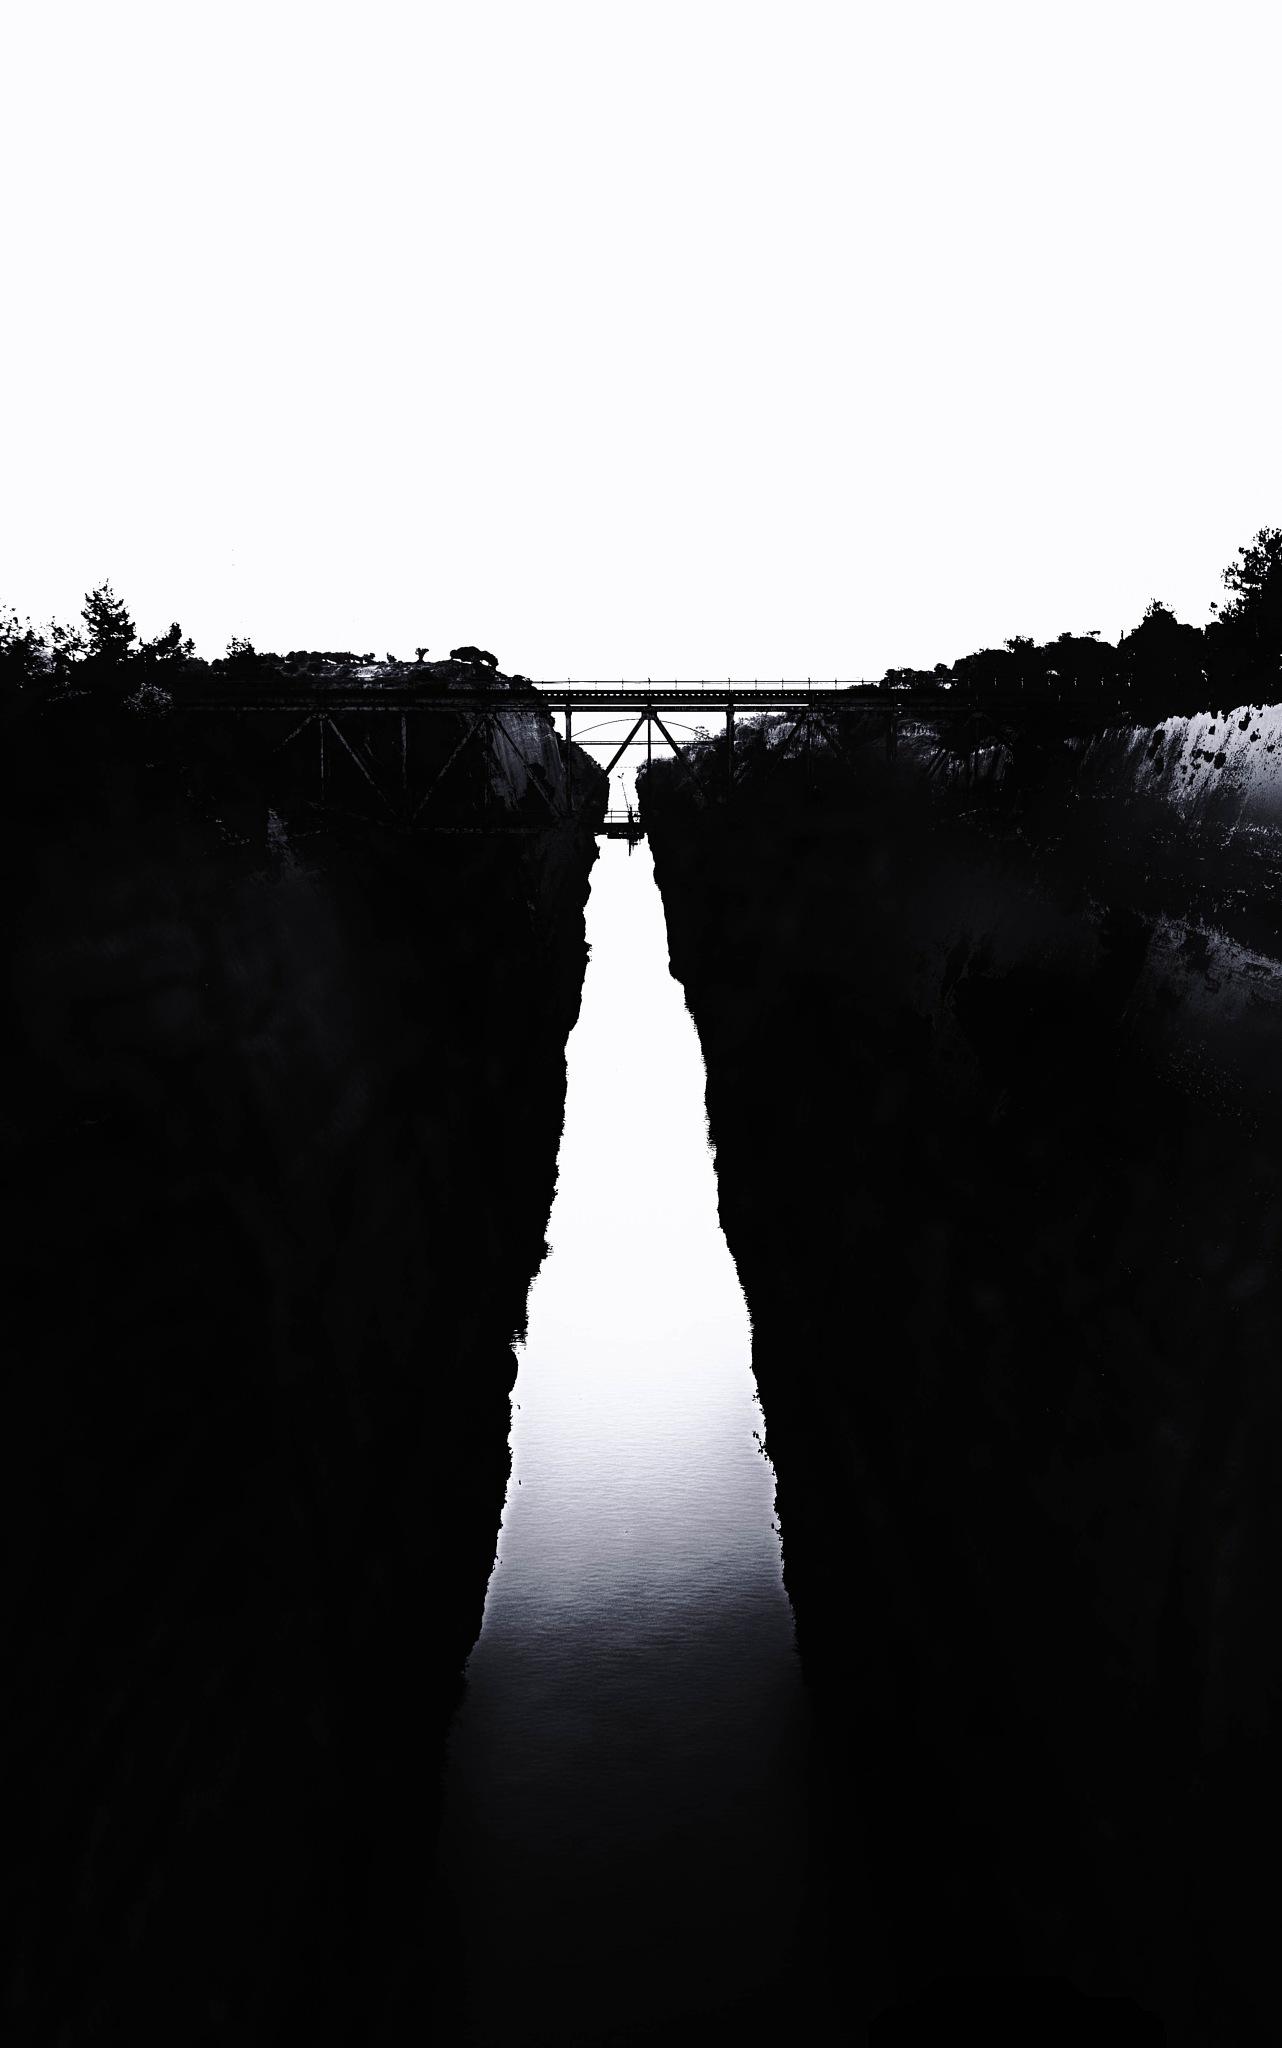 Isme Corinthe by Paul Krylatov